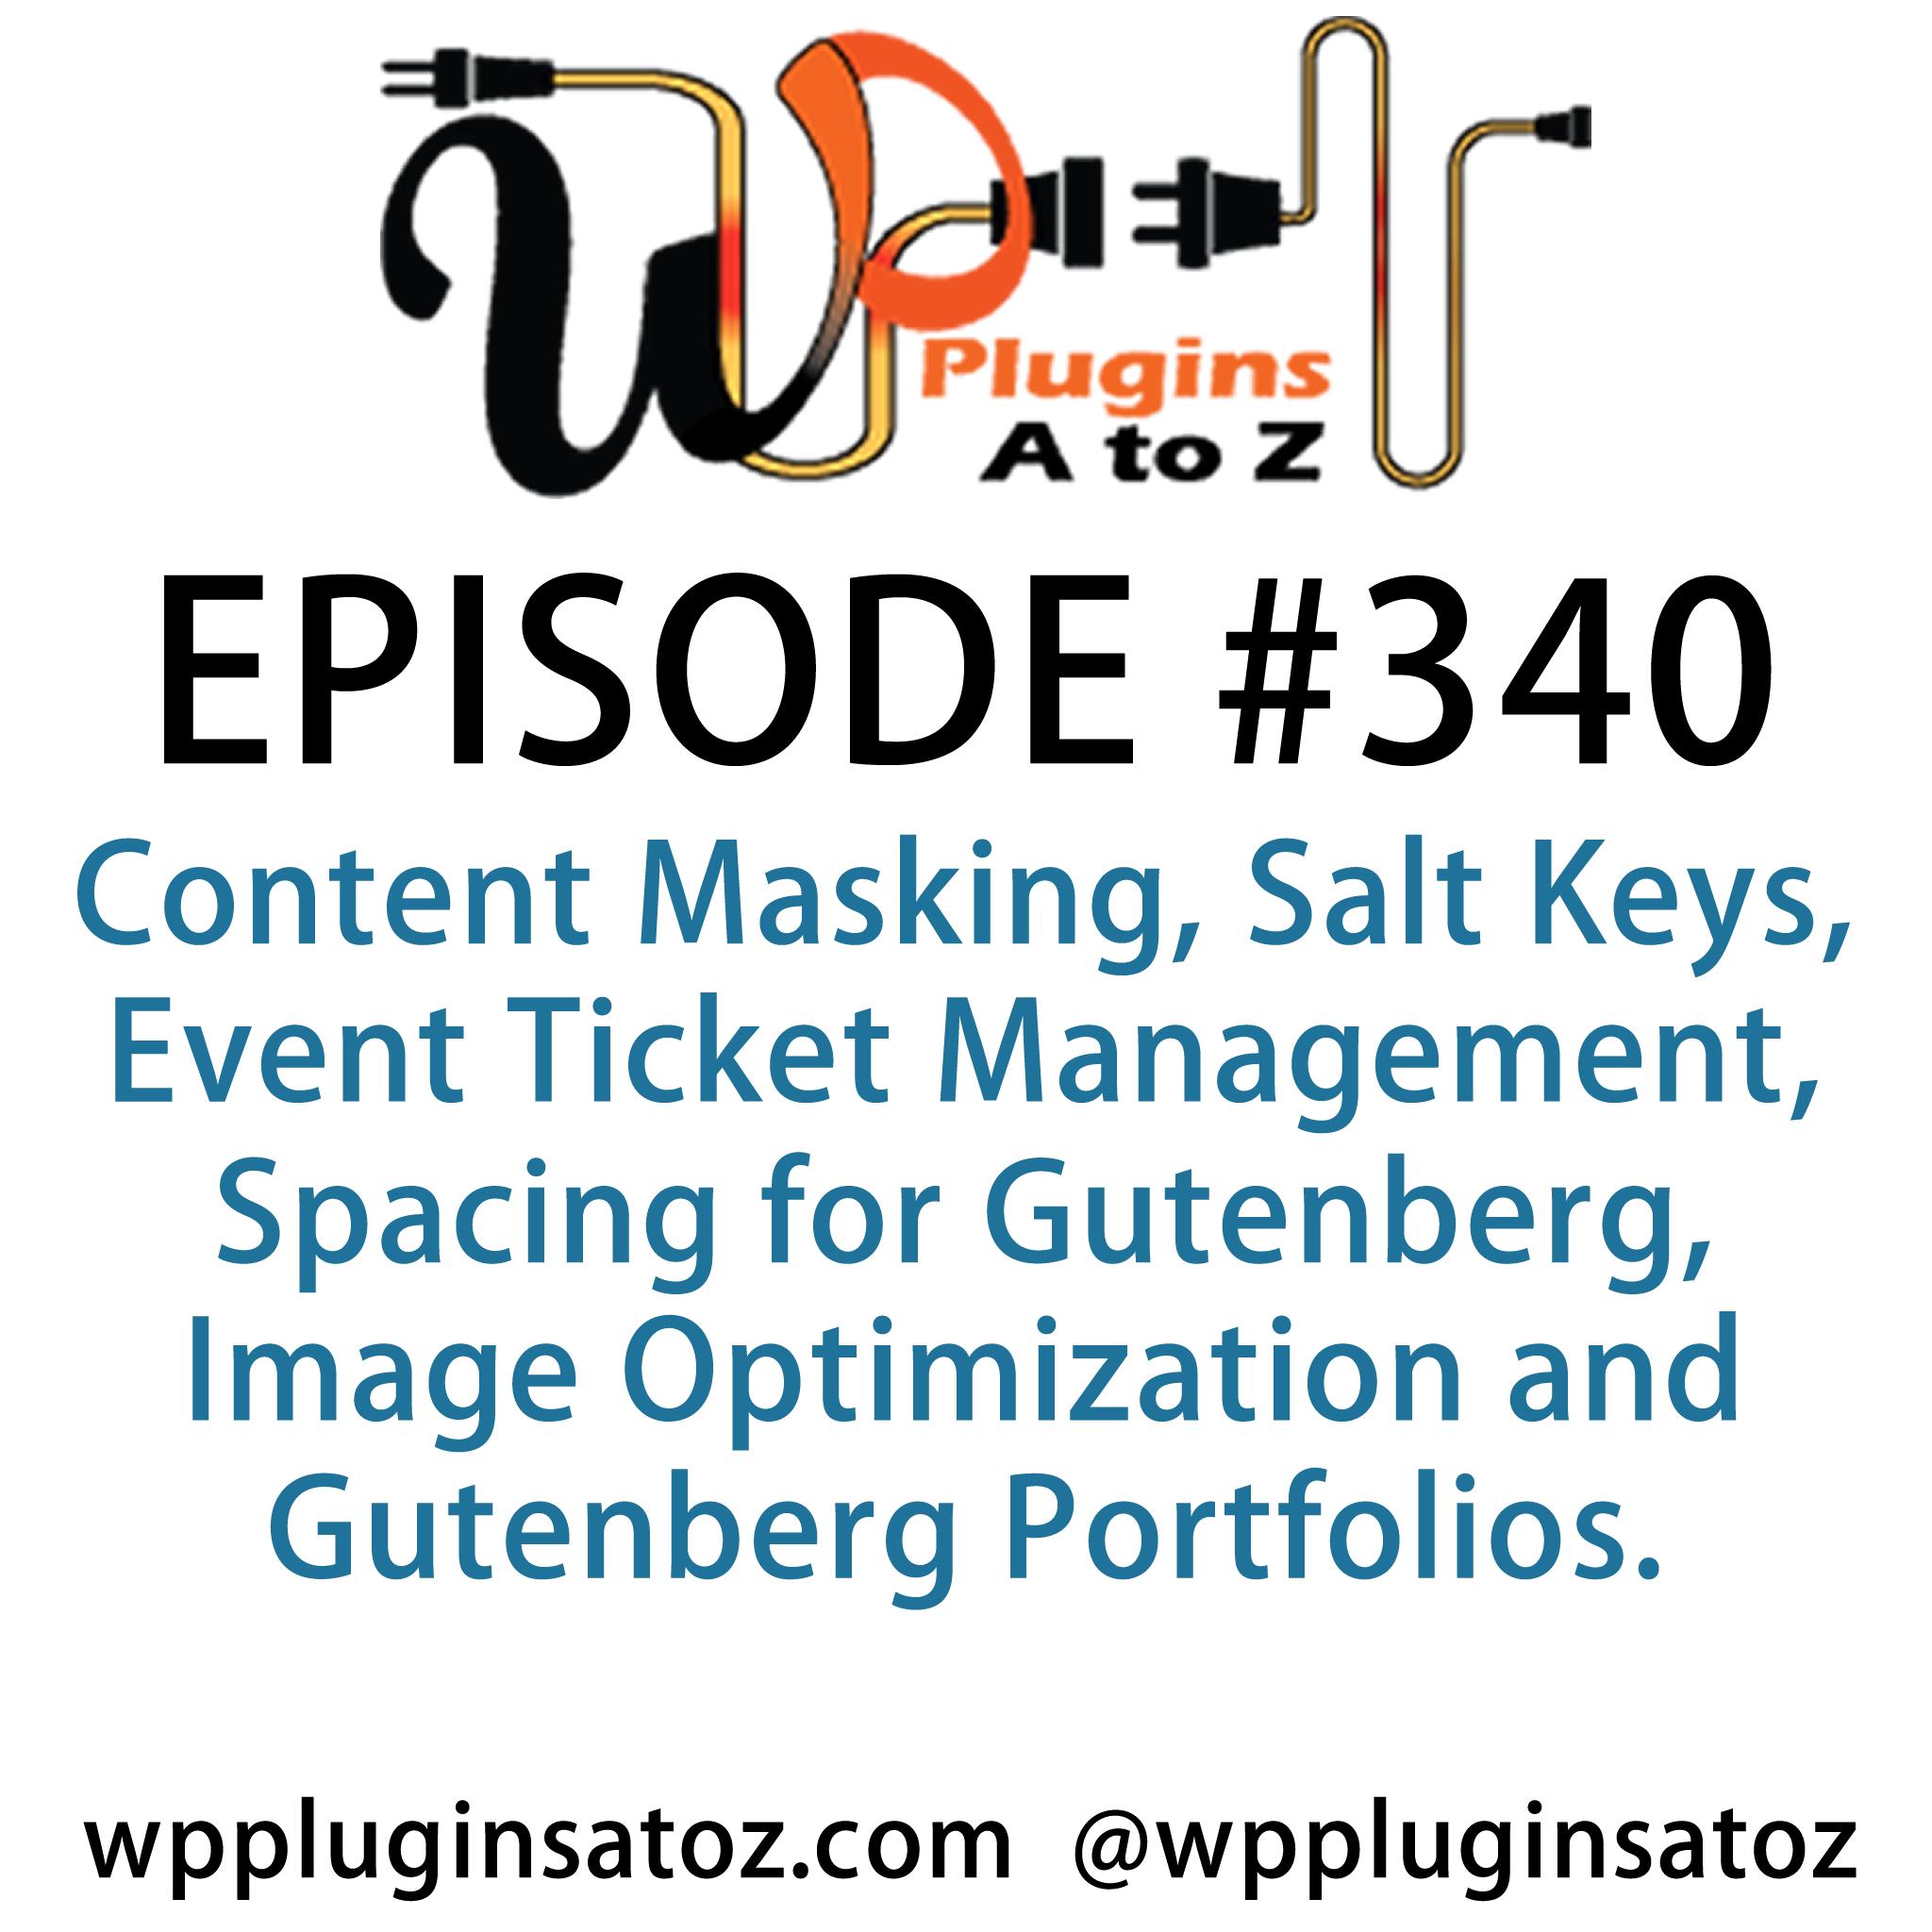 WordPress Plugins A to Z Episode 340 Content Masking, Salt